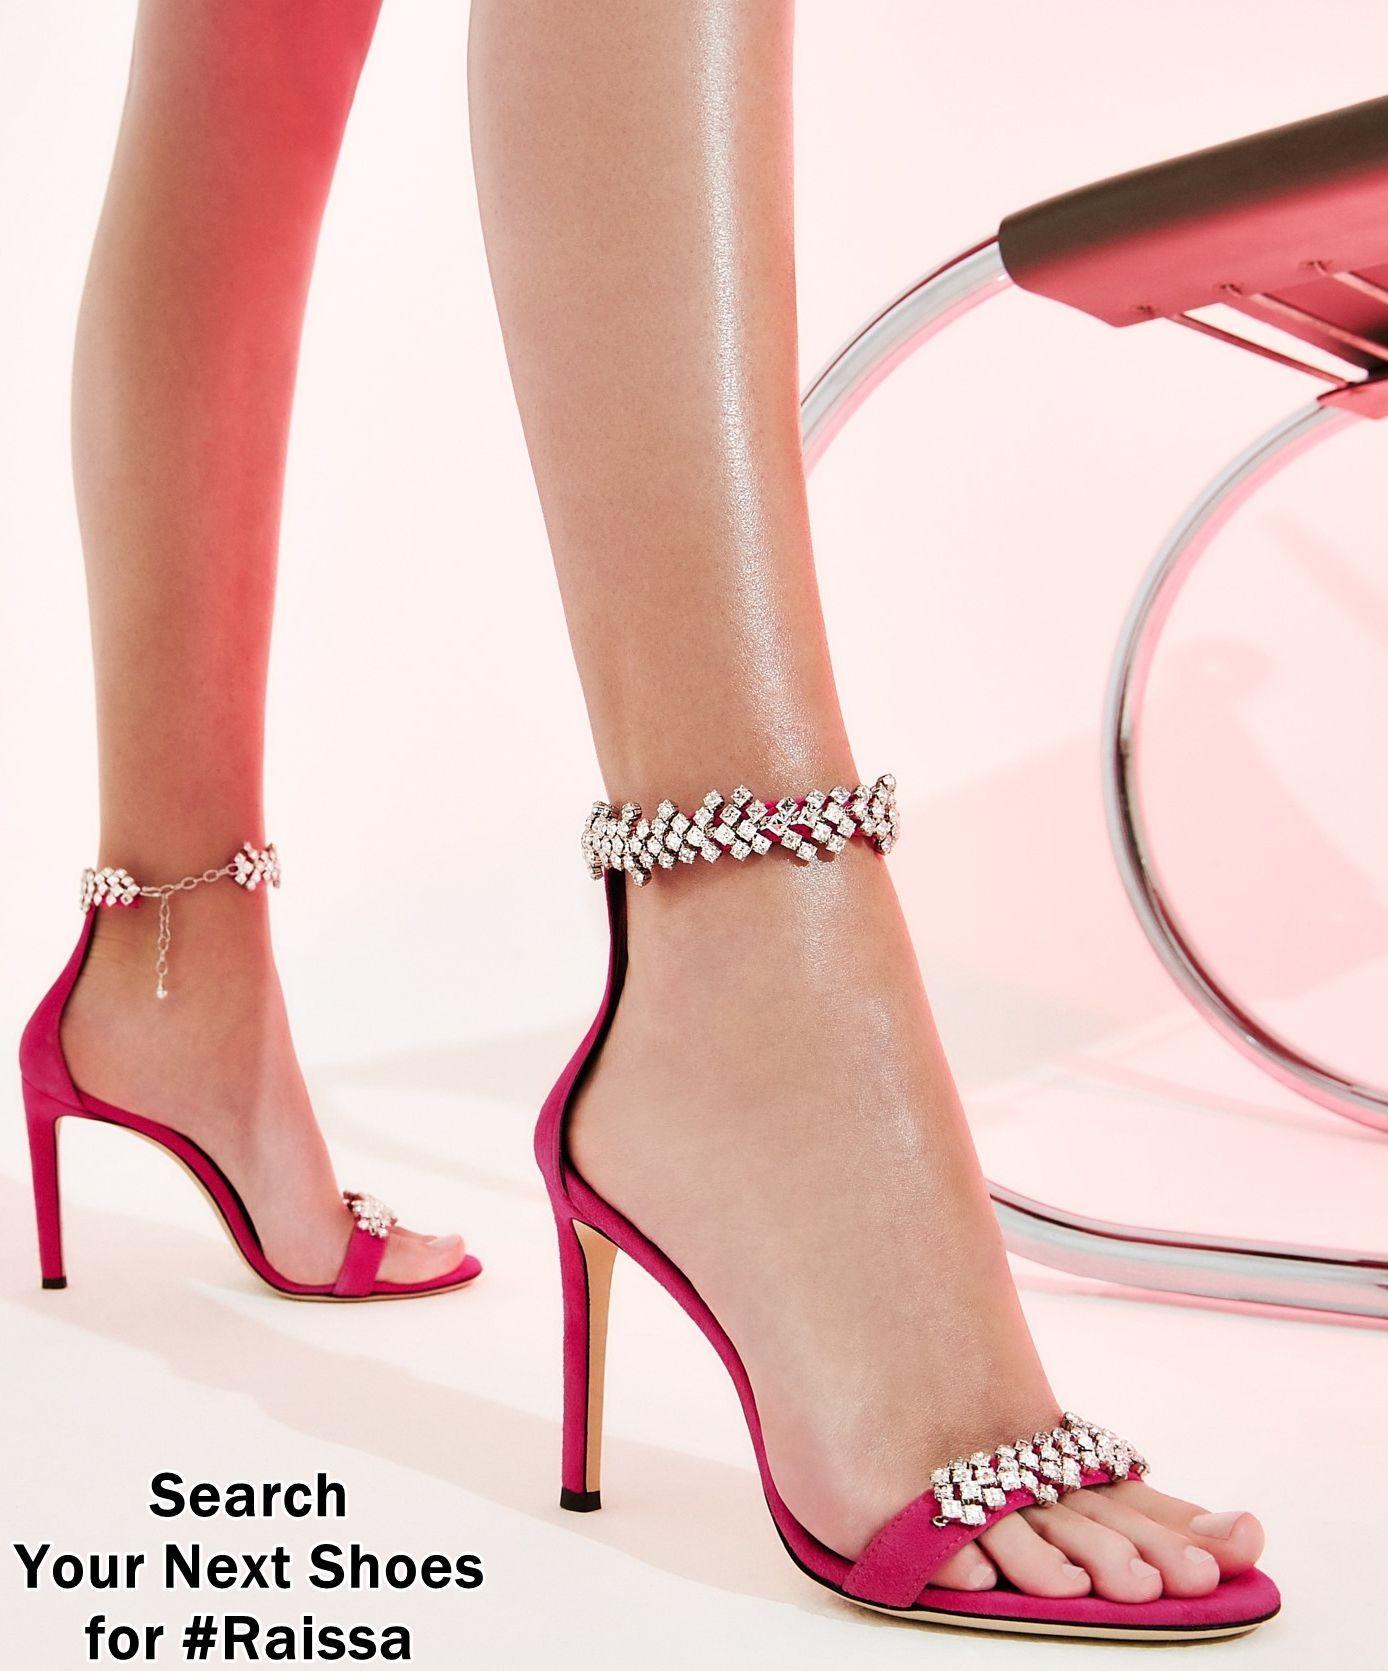 Pink Women S Crystal Embellished Shoes Funky Heels Pink High Heels Heels [ 1671 x 1388 Pixel ]